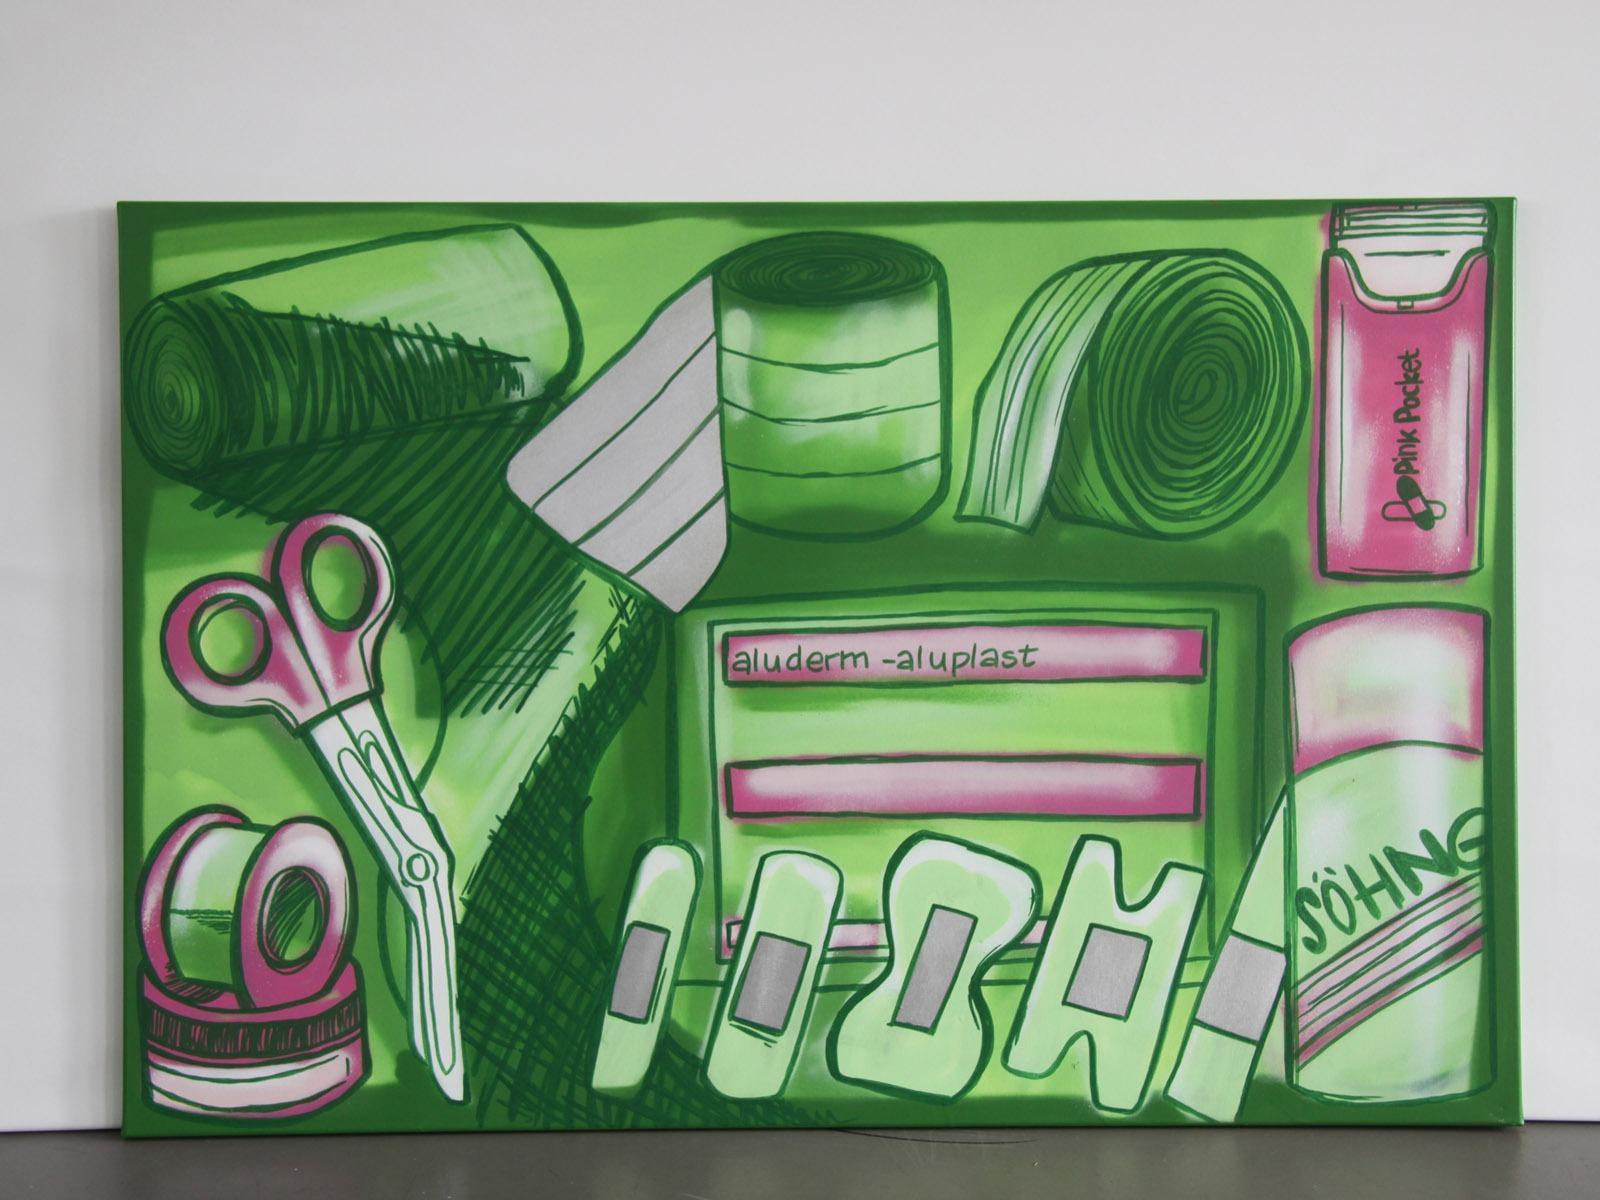 graffitiauftrag-graffitikuenstler-artmos4-leinwand-soehngenag-illustrativ